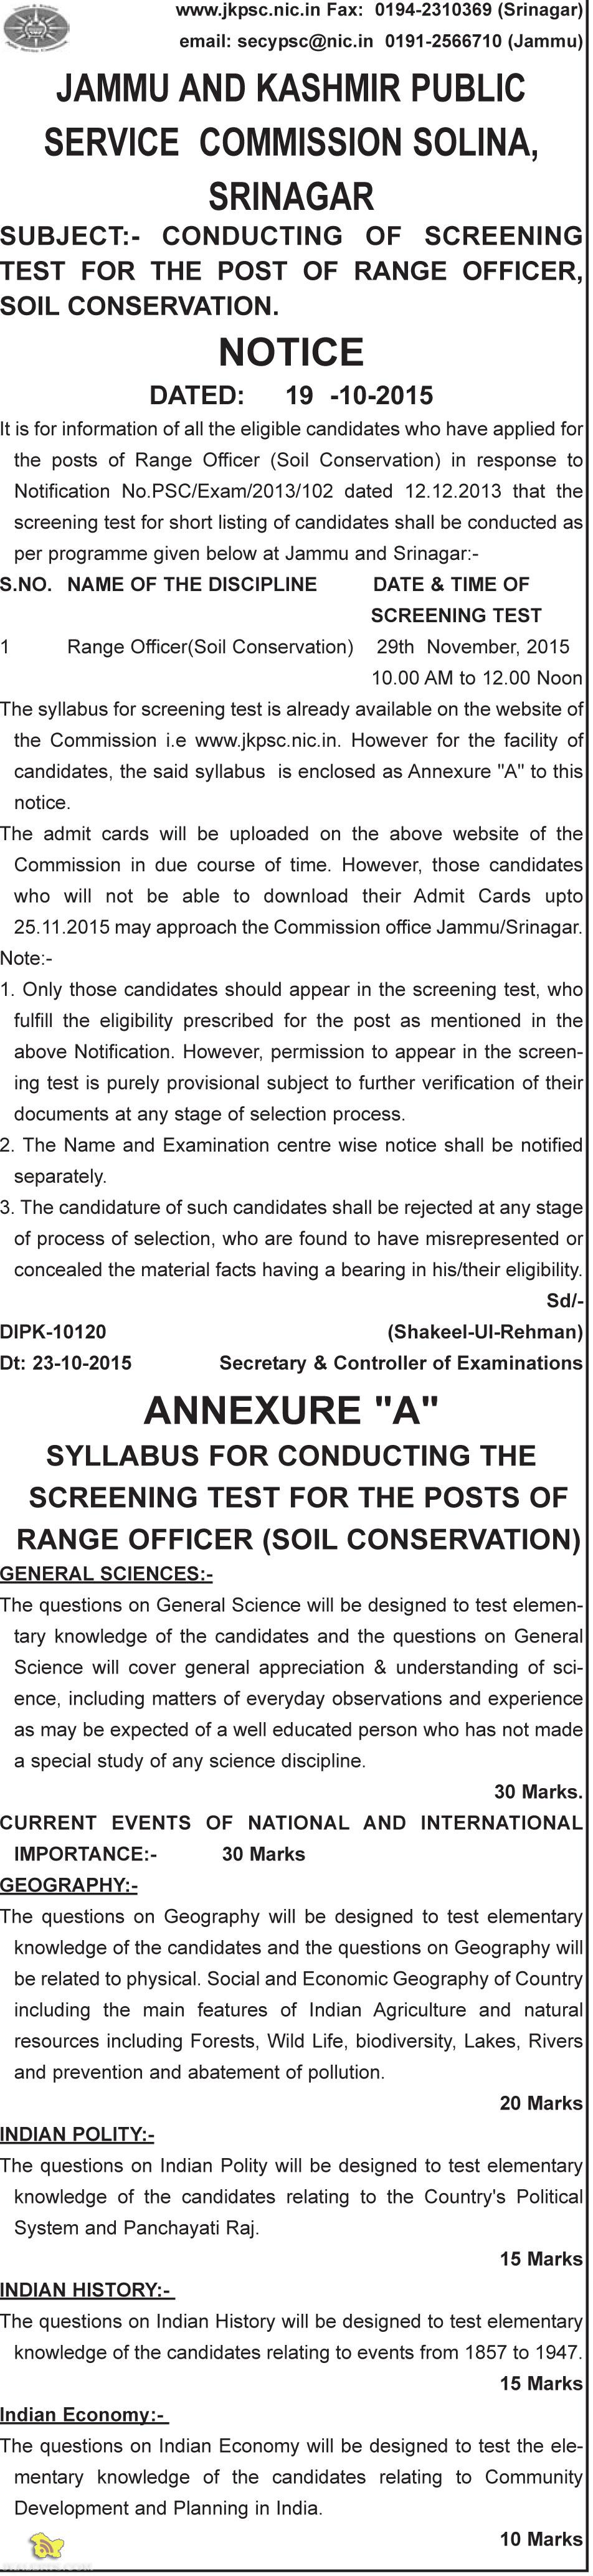 JKPSC Range Officer (Soil Conservation) SCREENING TEST 2015 Notification